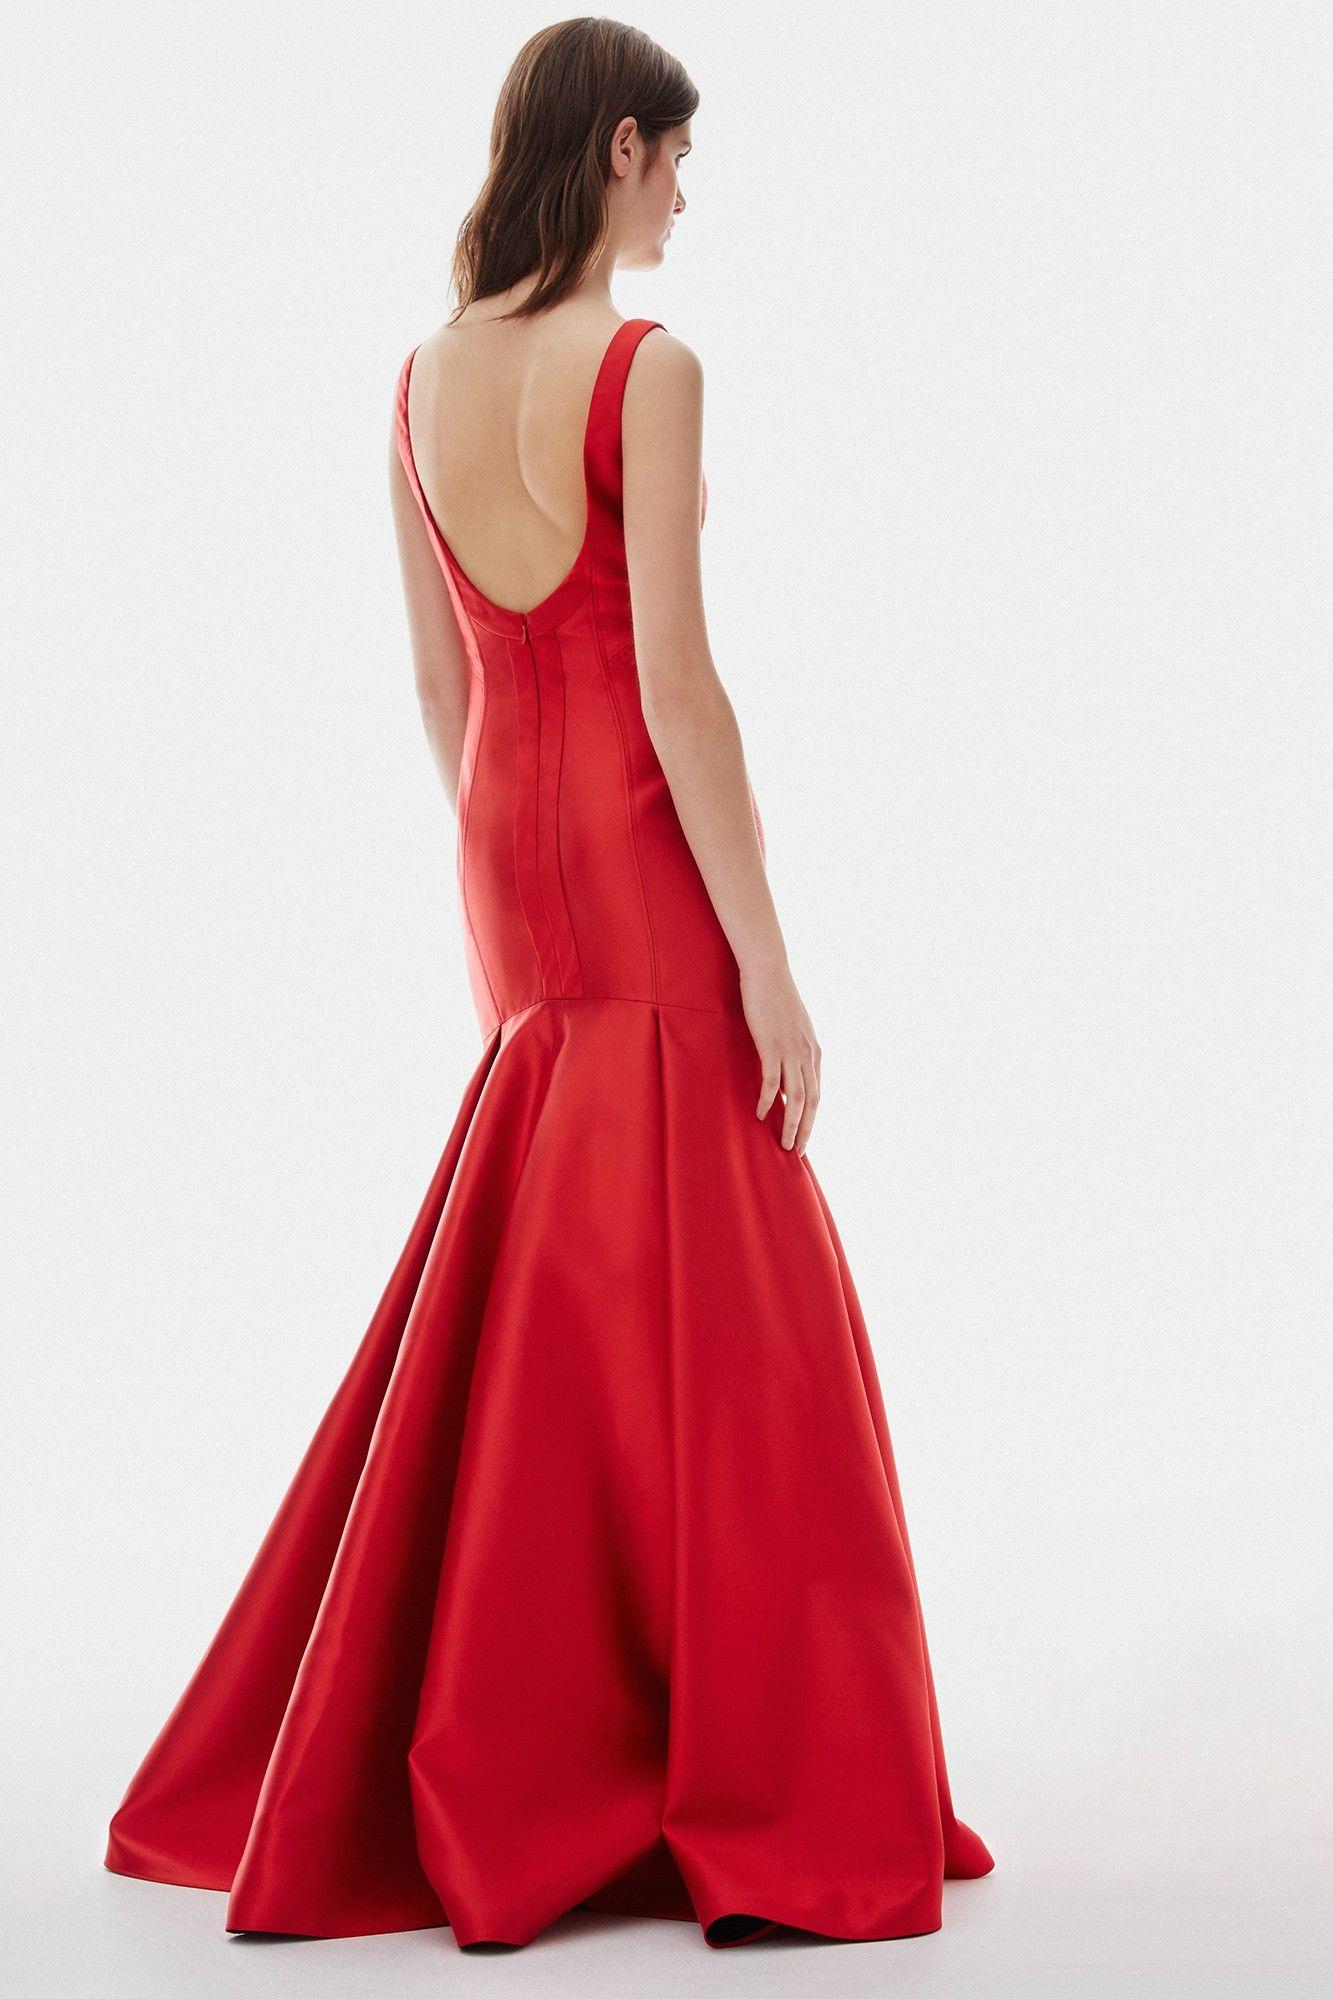 b1dd982466 Vestido rojo largo de corte sirena - cóctel